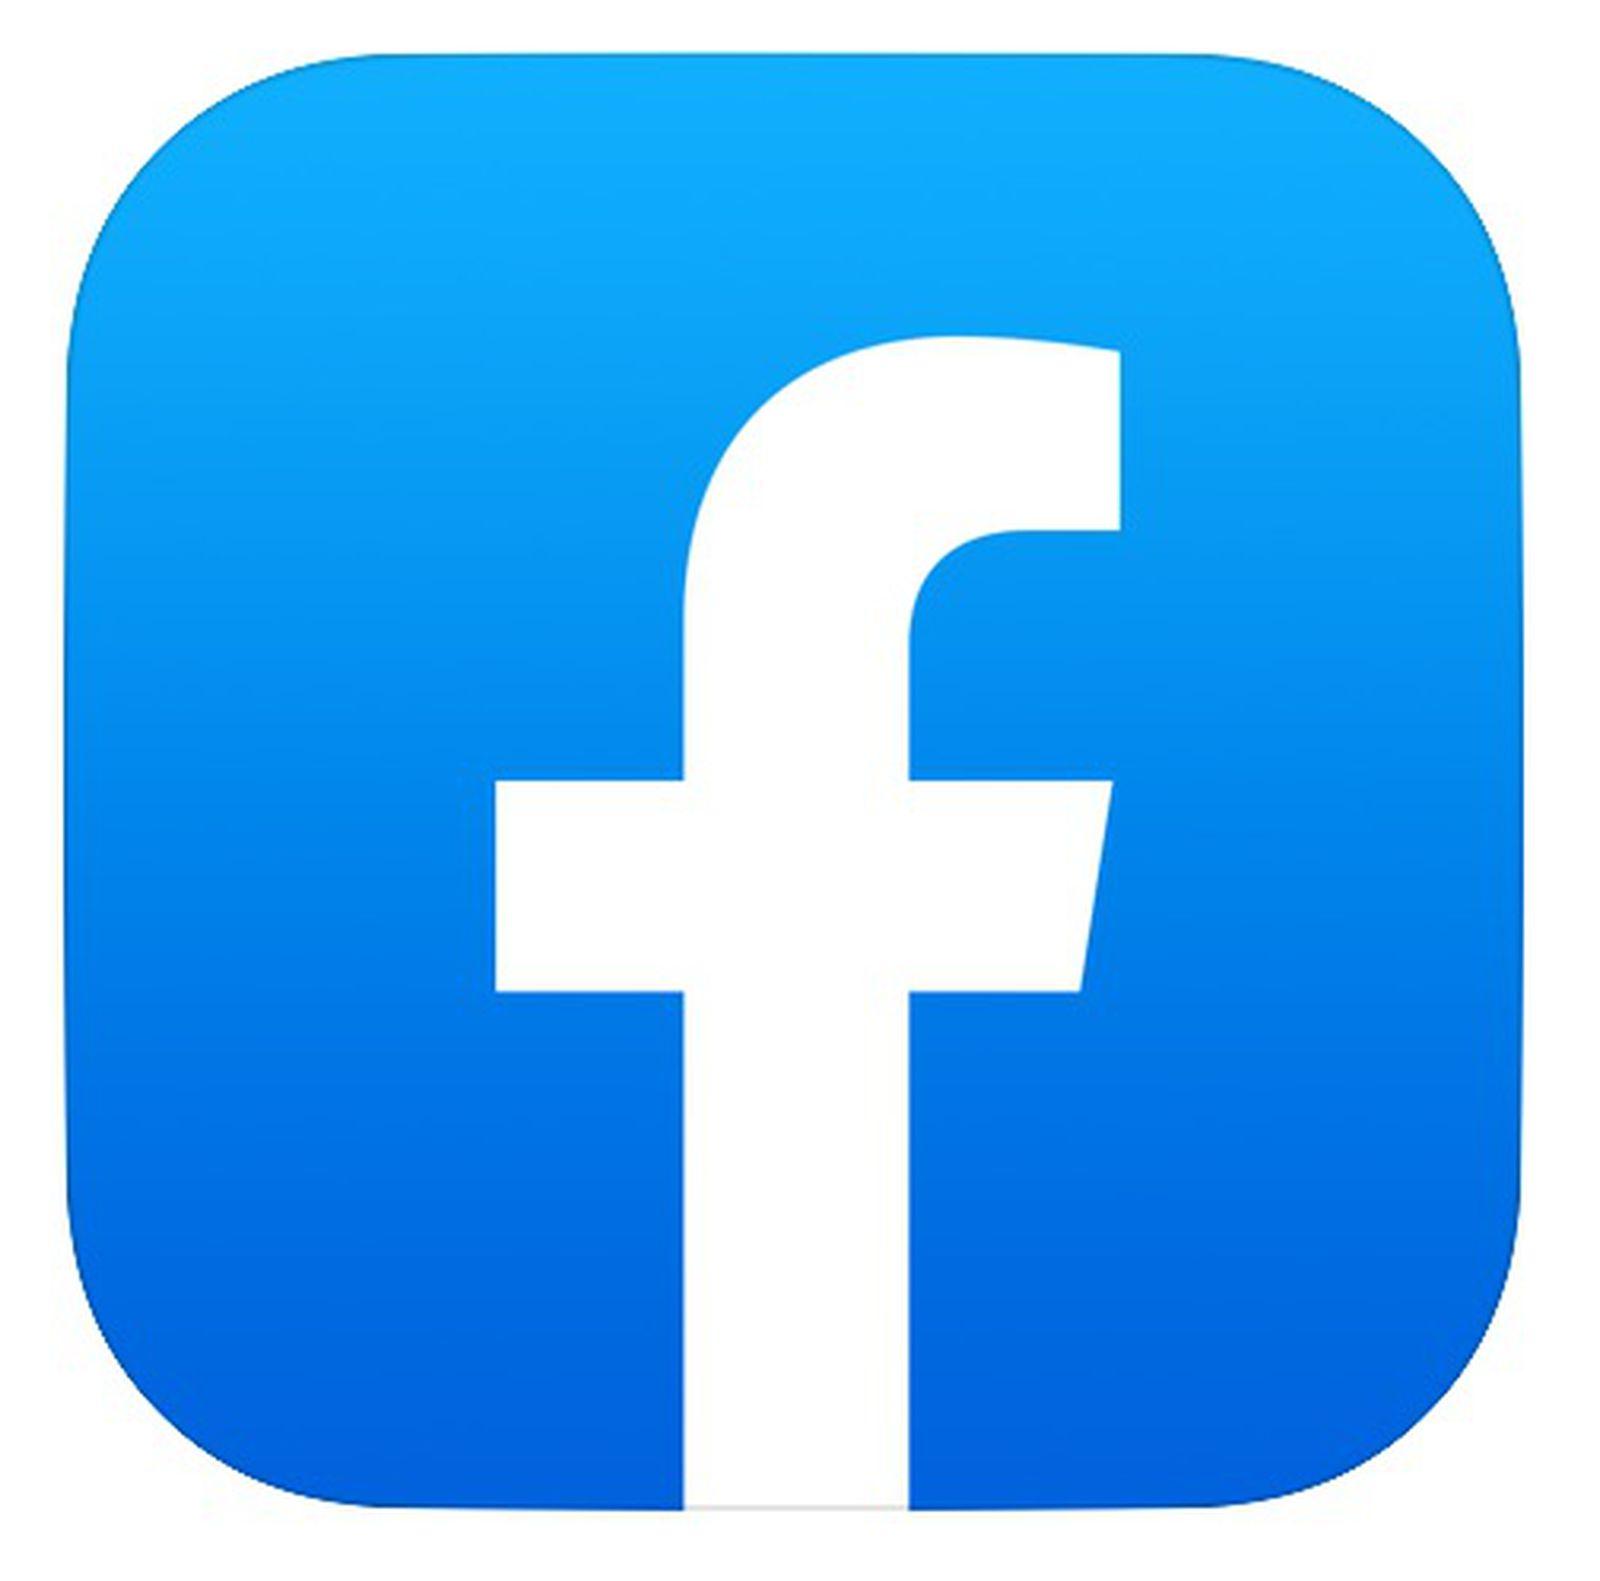 Facebook Kills Off Slimmed Down Facebook Lite App Due To Low Adoption Macrumors Последние твиты от facebook lite (@facebook_lite). facebook lite app due to low adoption